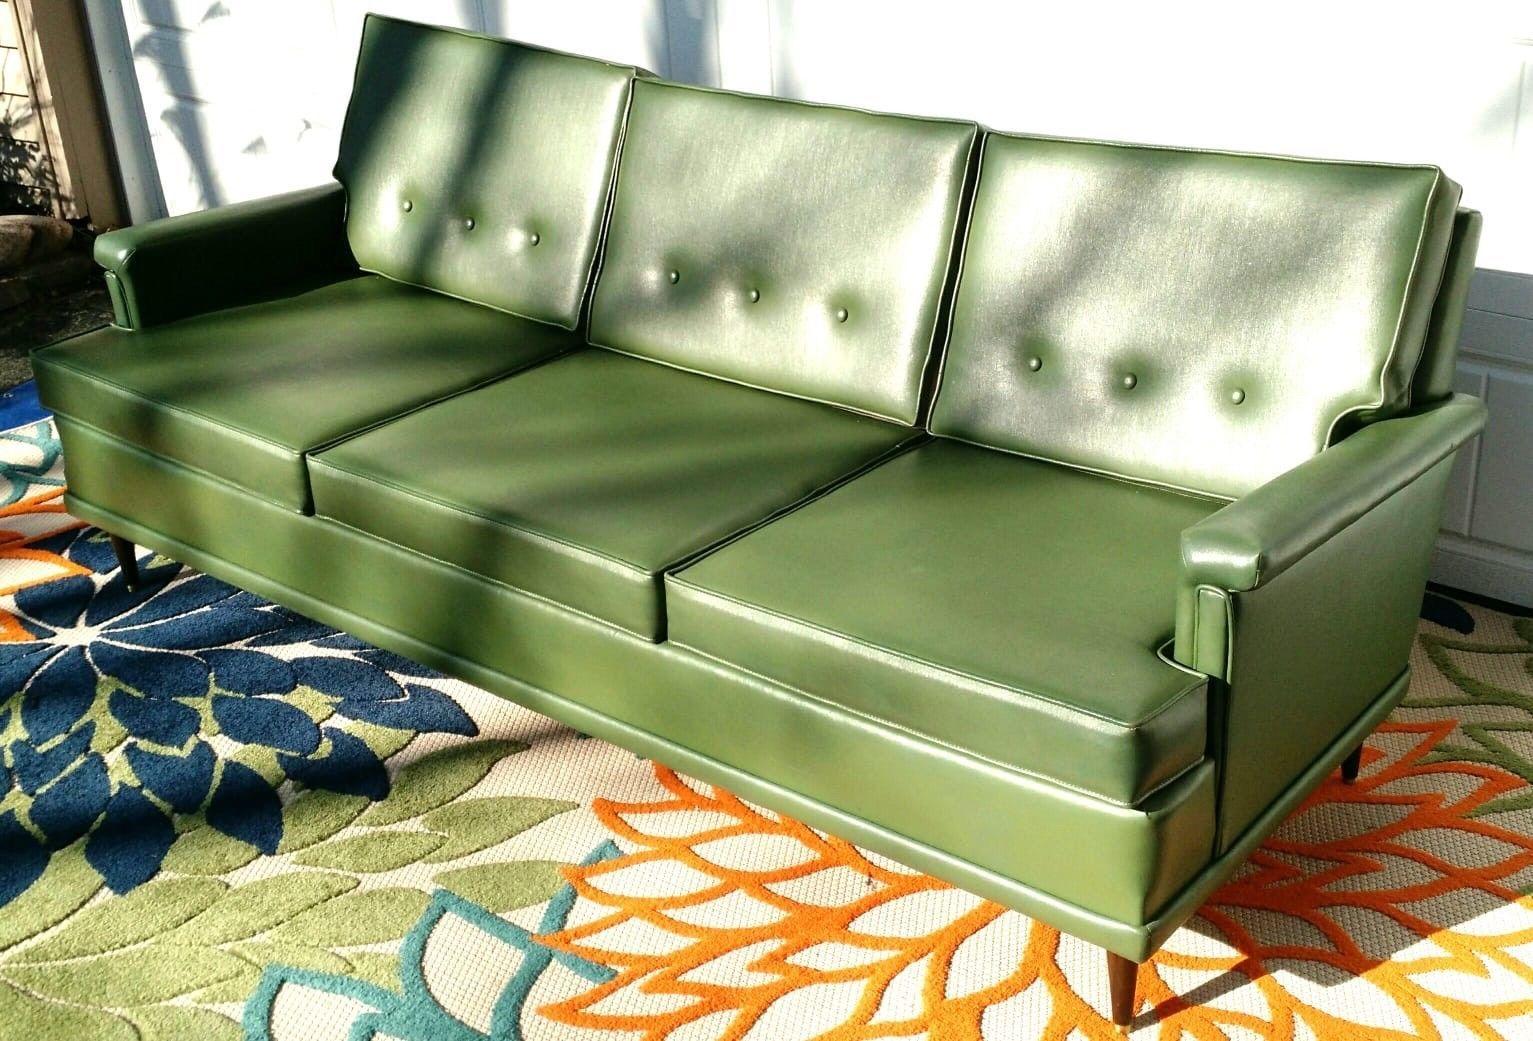 Vintage Mid Century Modern 60 S Flexsteel Green Naugahyde Vinyl Couch Sofa Sofa Couch Danish Modern Couch Couch